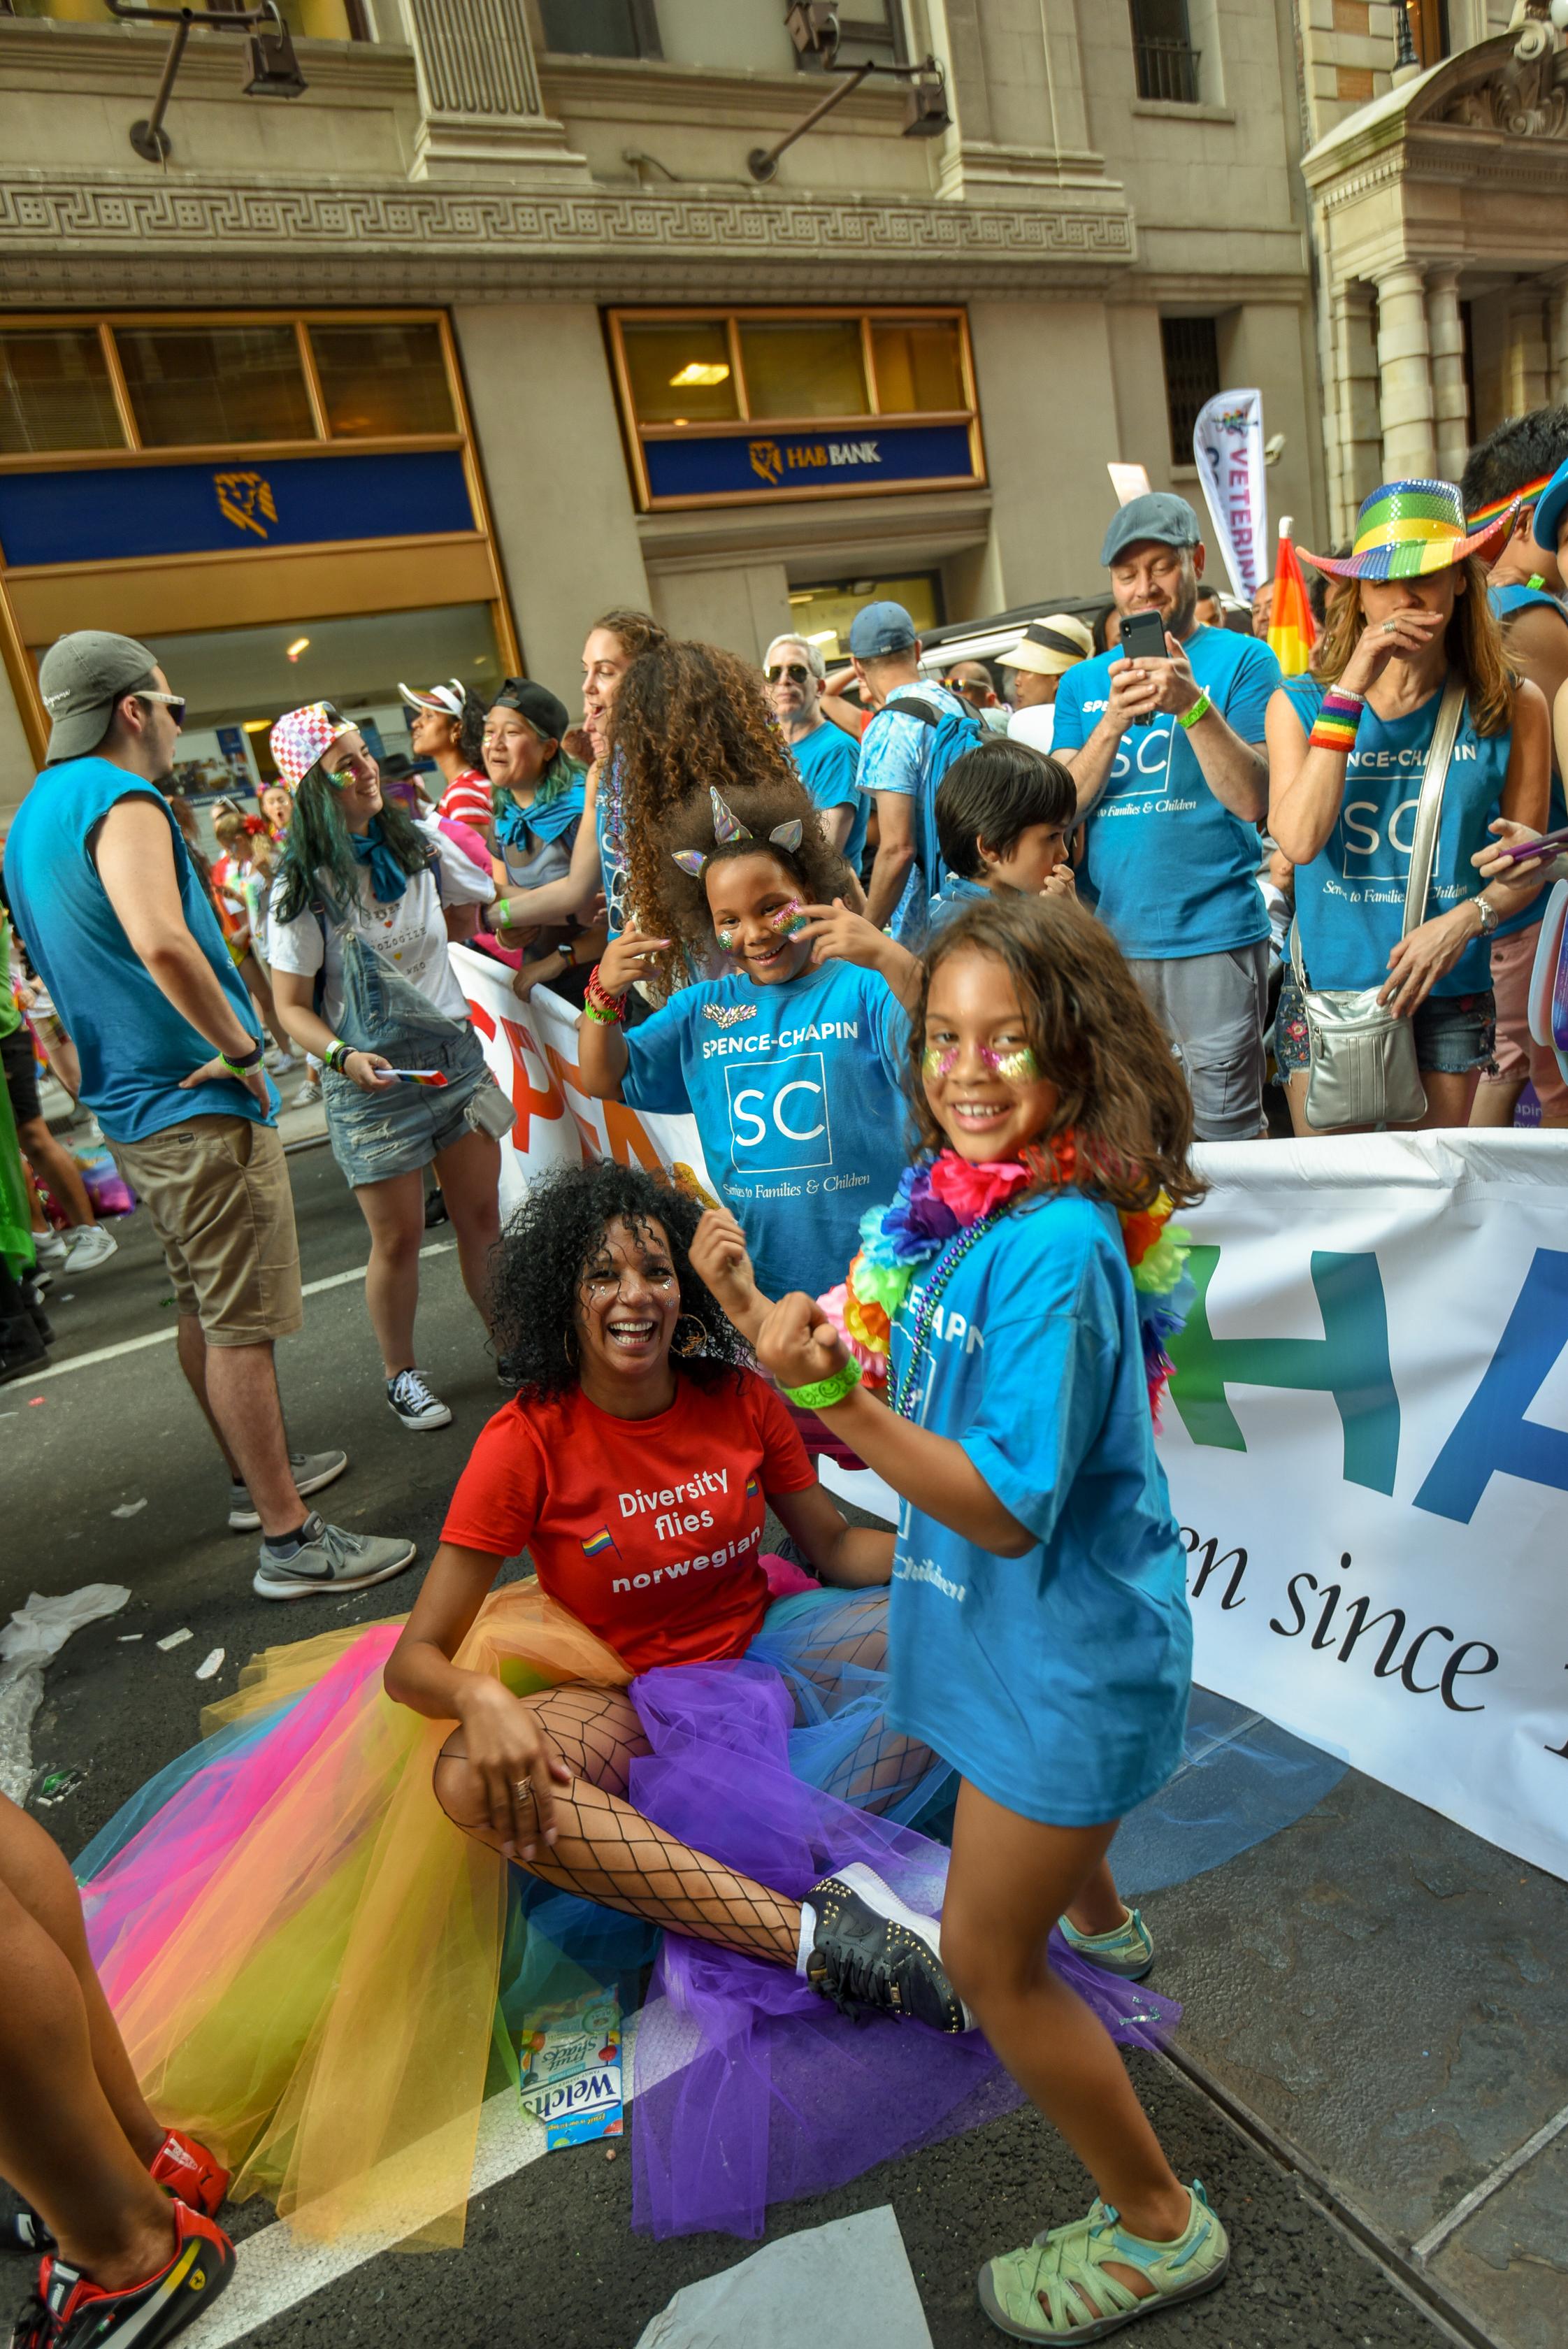 SC-PrideParade-2019_FE-221.jpg